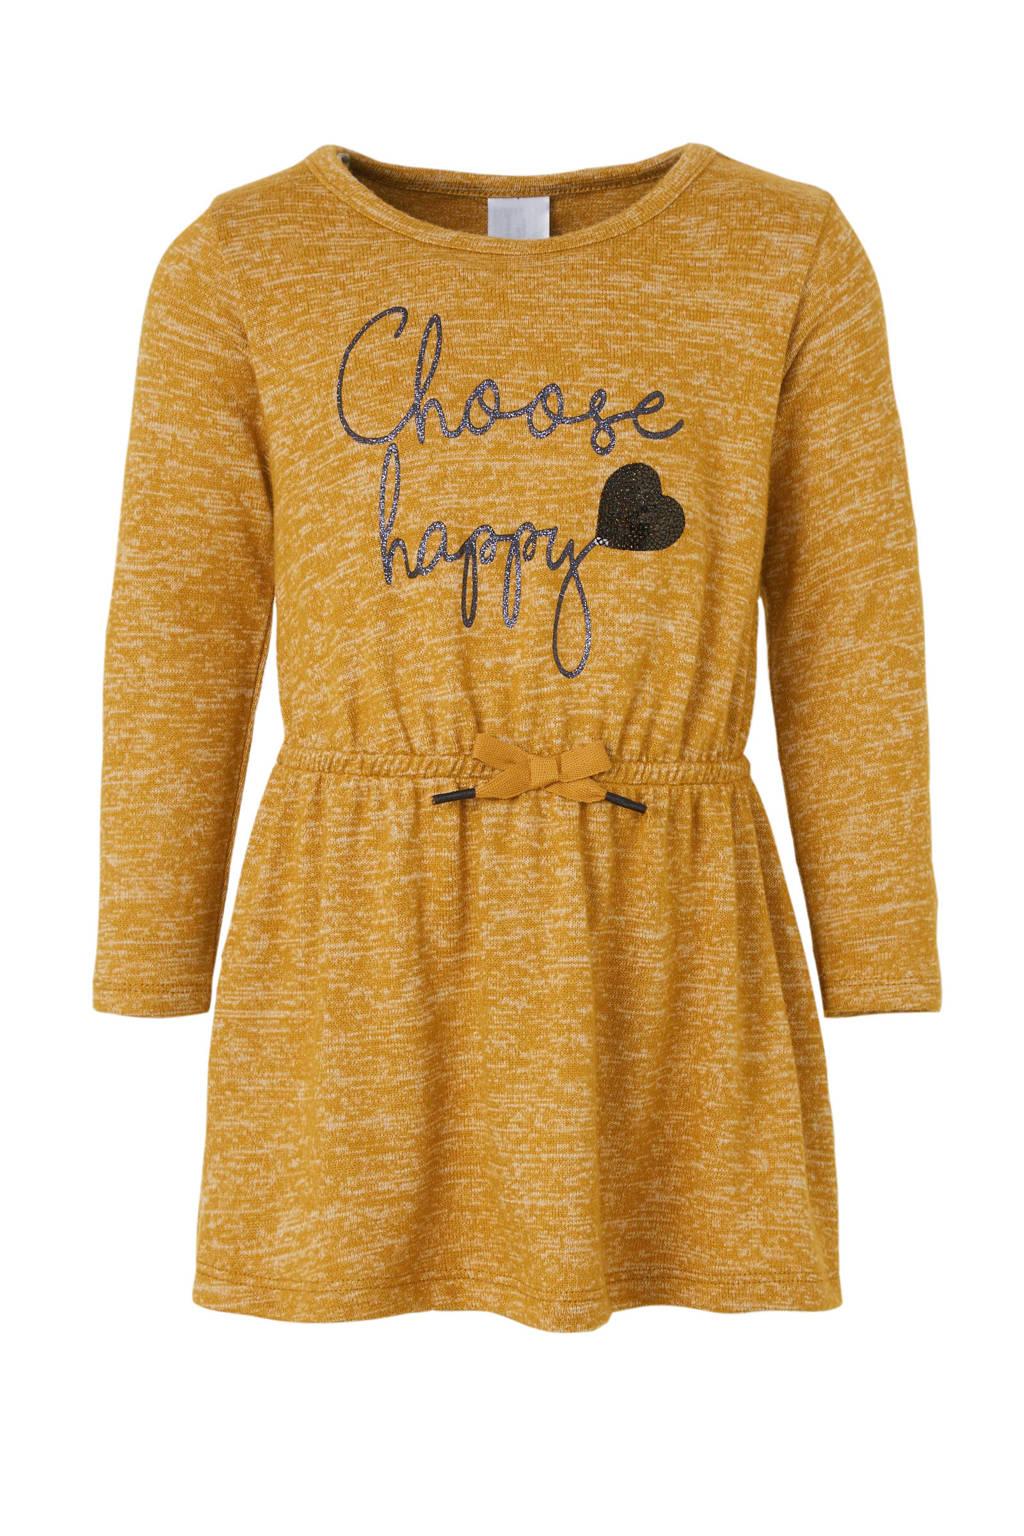 C&A Palomino jurk met tekst en pailletten camel/zwart, Camel/zwart